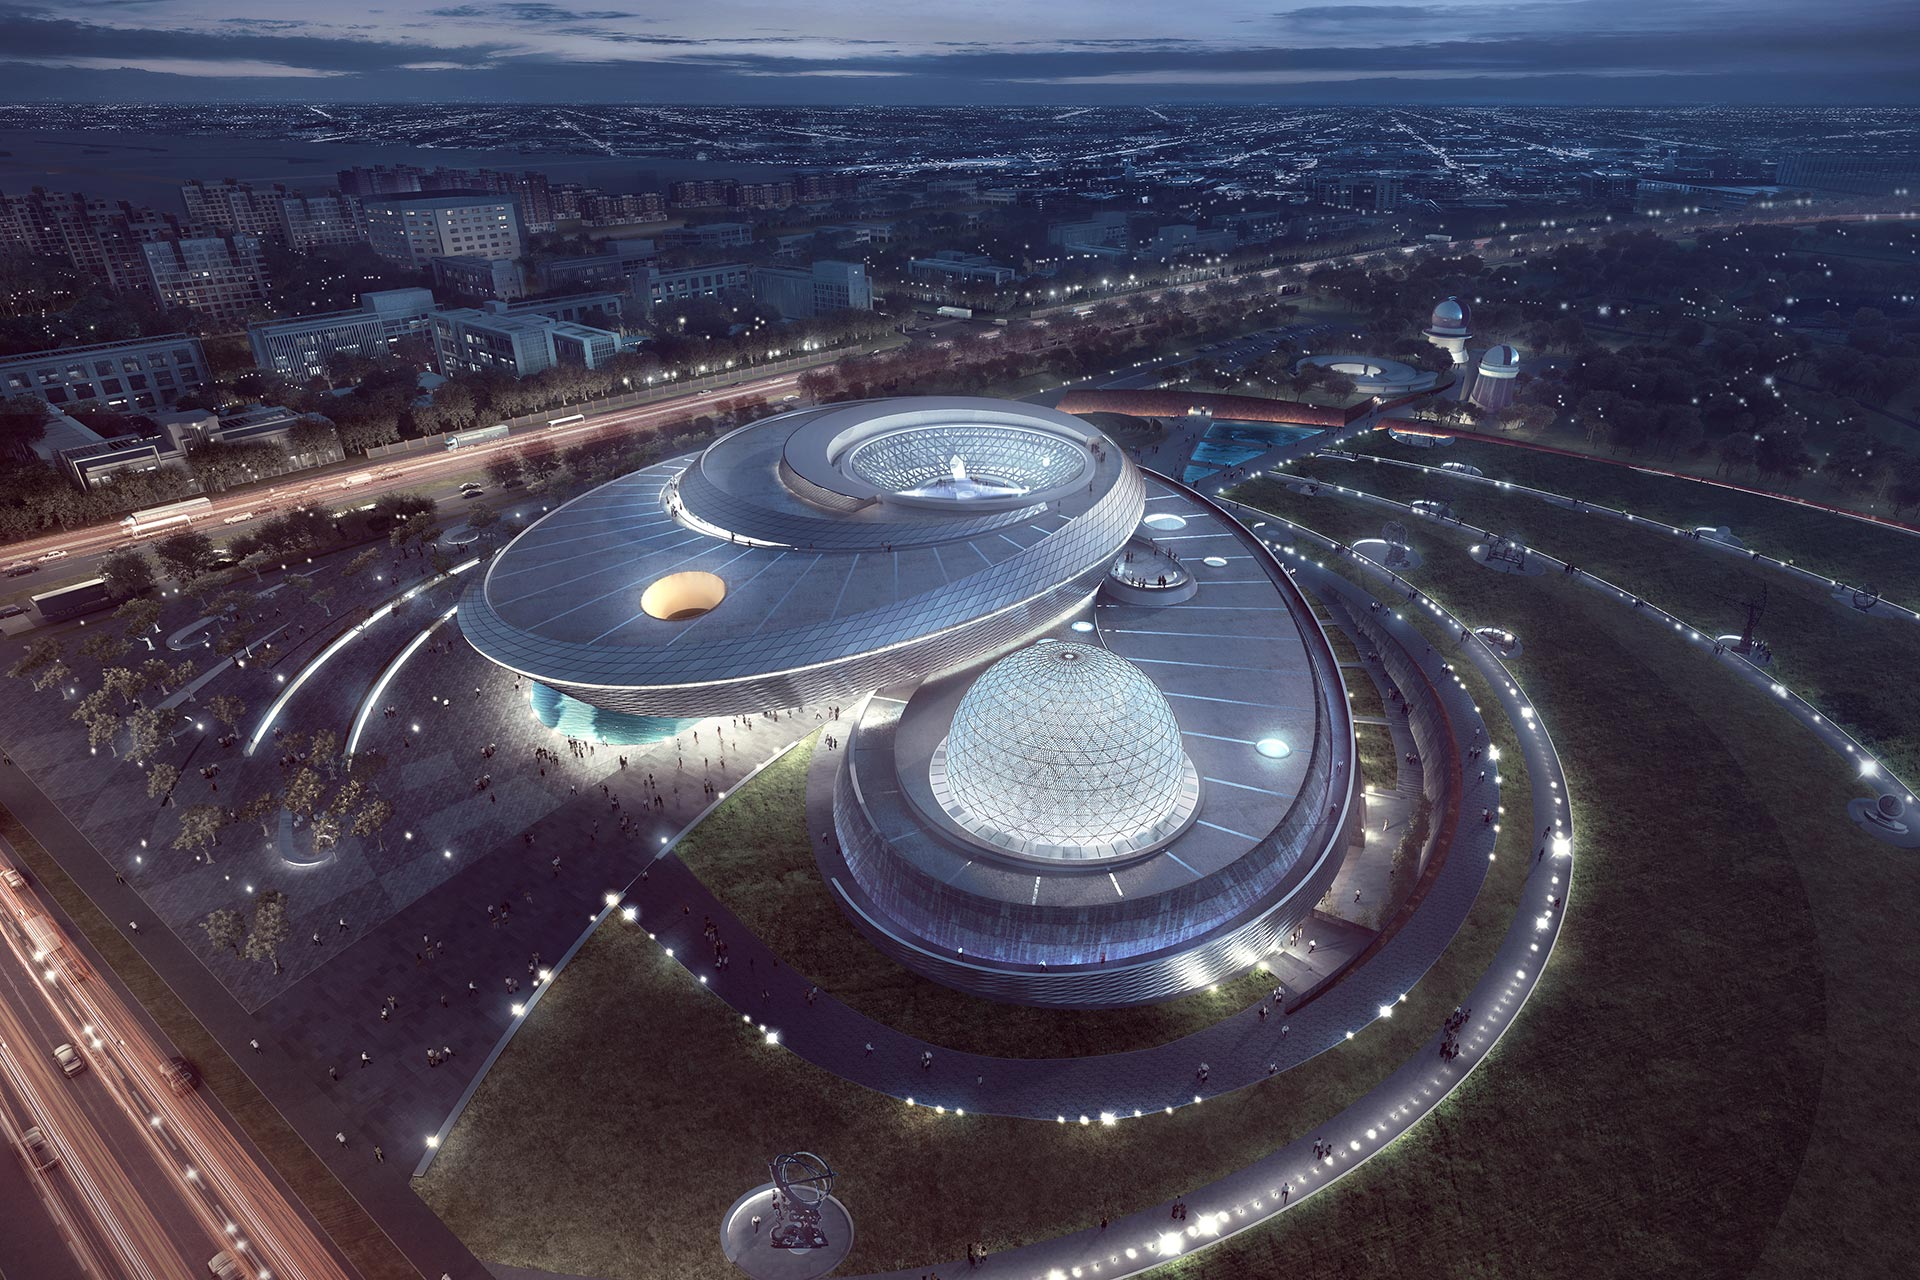 Shanghai Astronomy Museum, featuring Digistar 7 and Spitz NanoSeam dome as centerpiece